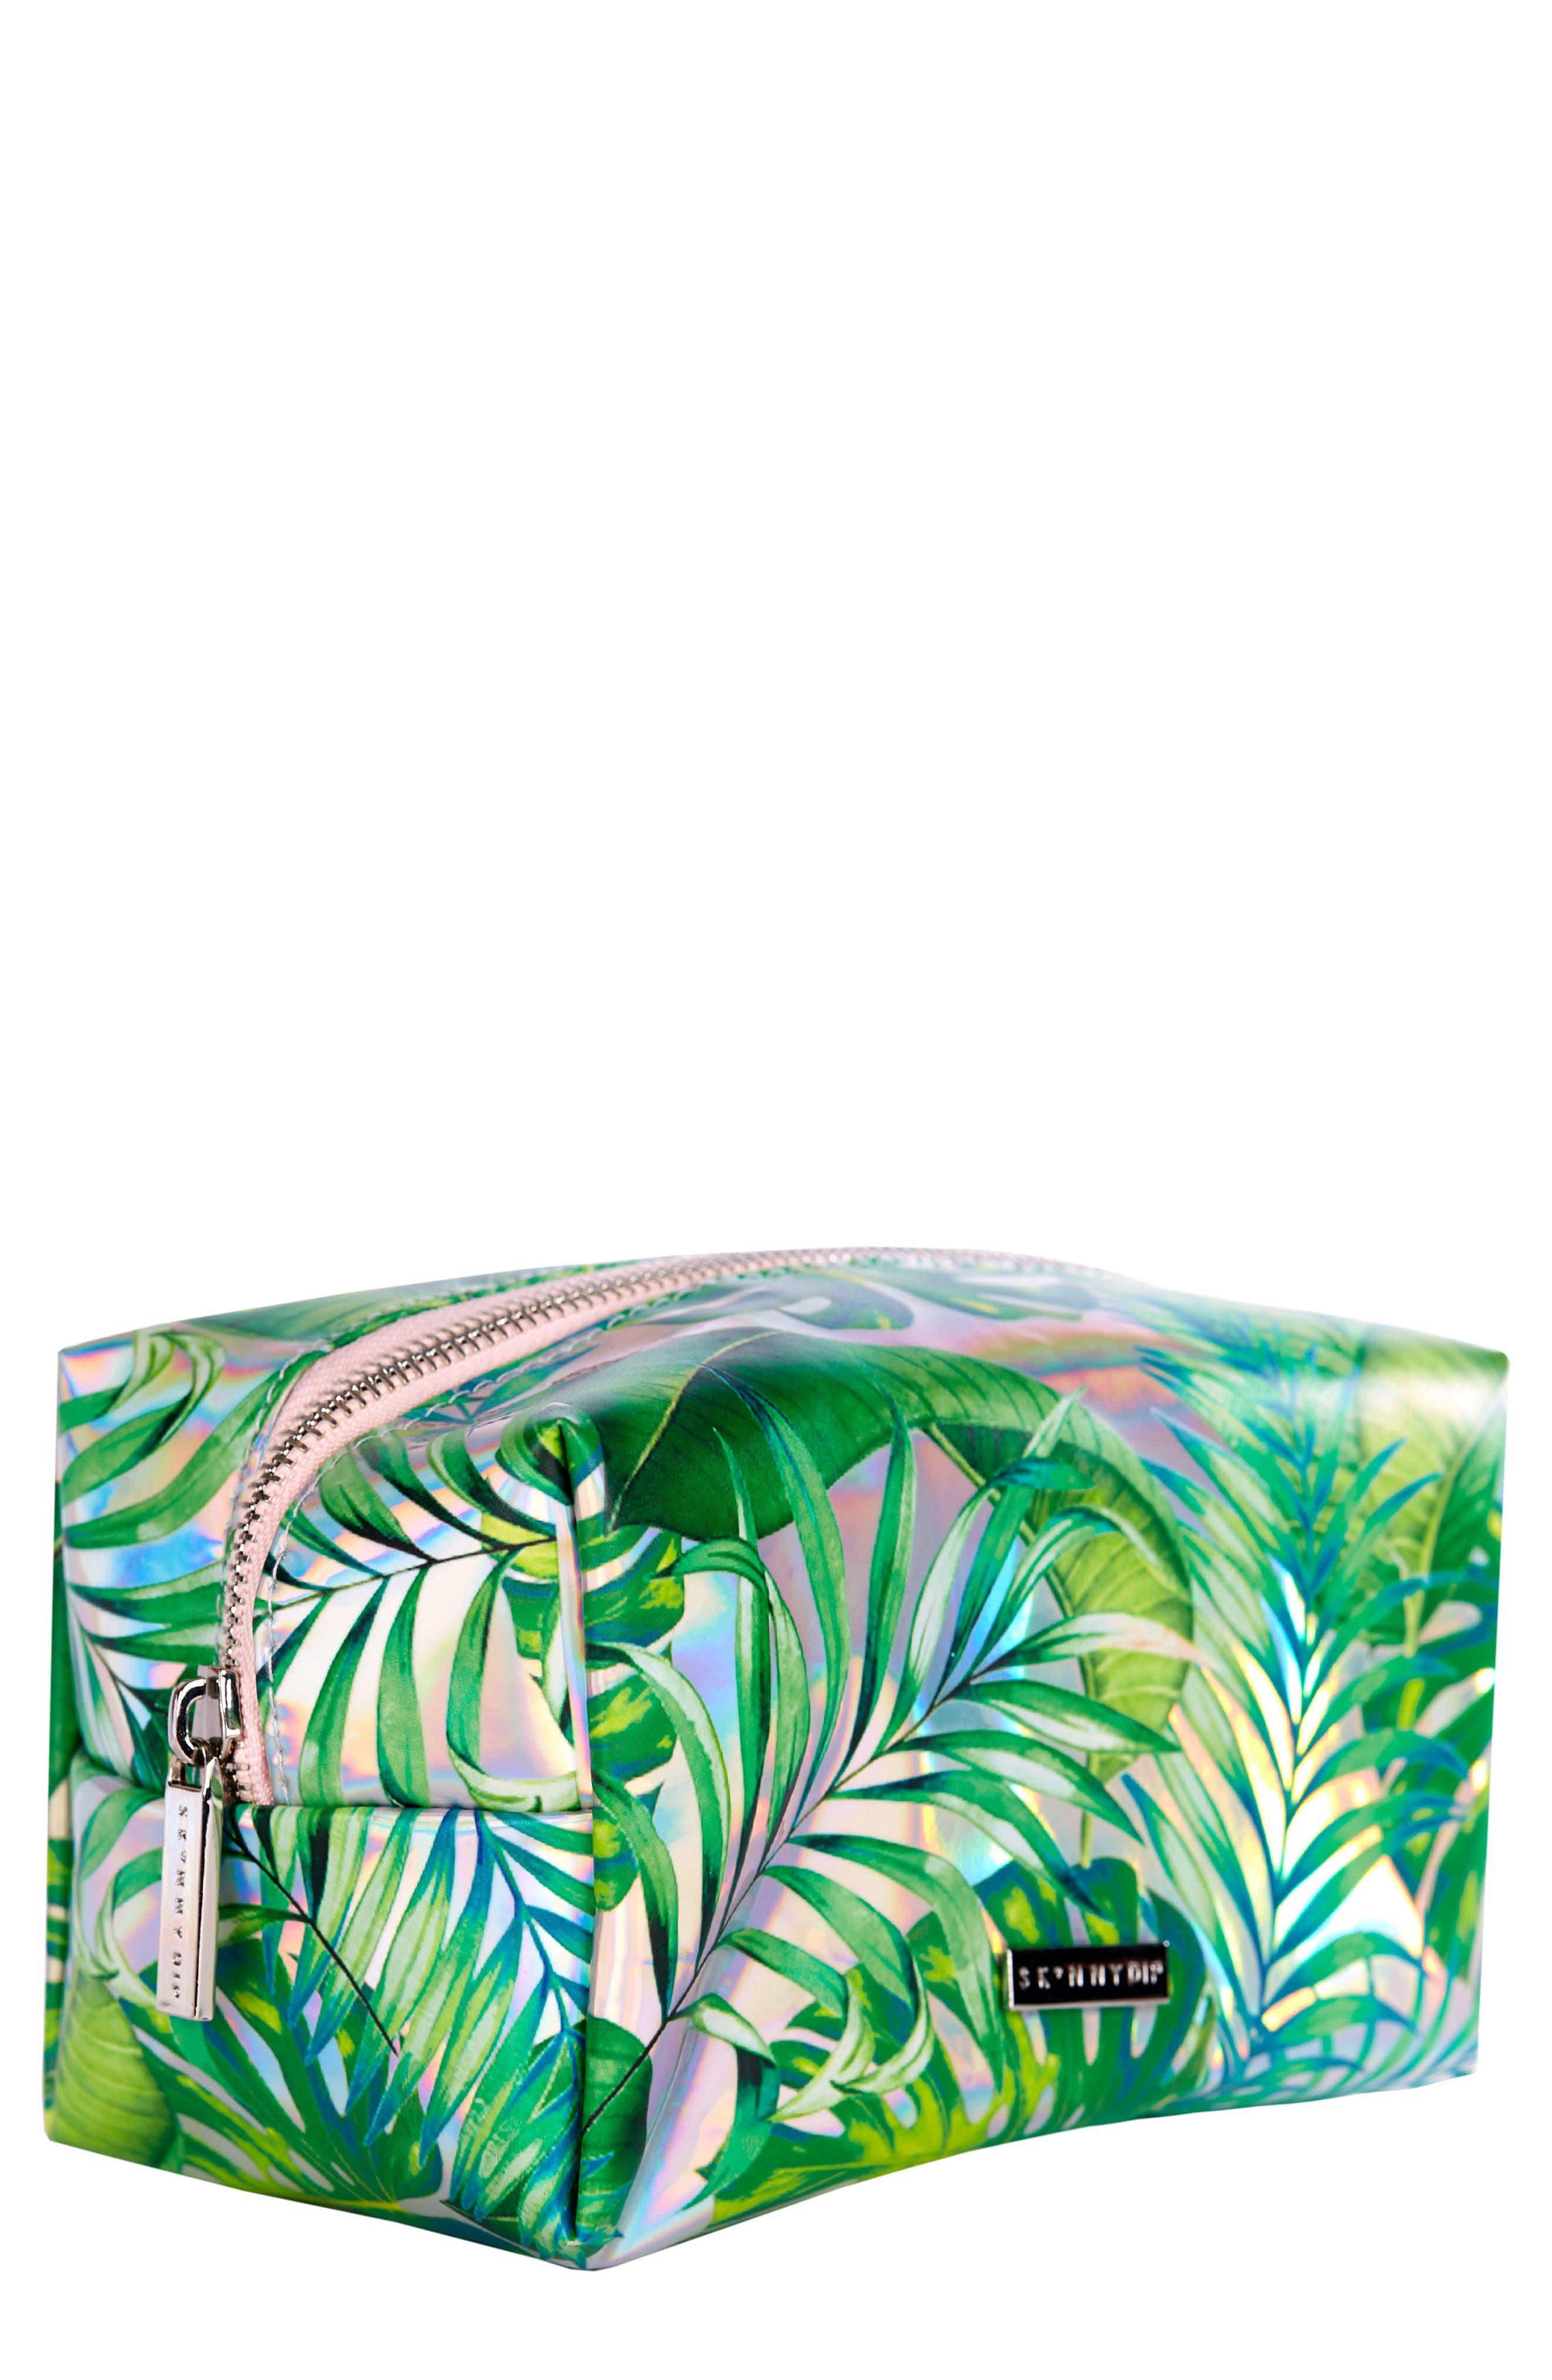 SKINNYDIP Skinny Dip Dominica Cosmetics Case, Main, color, 000